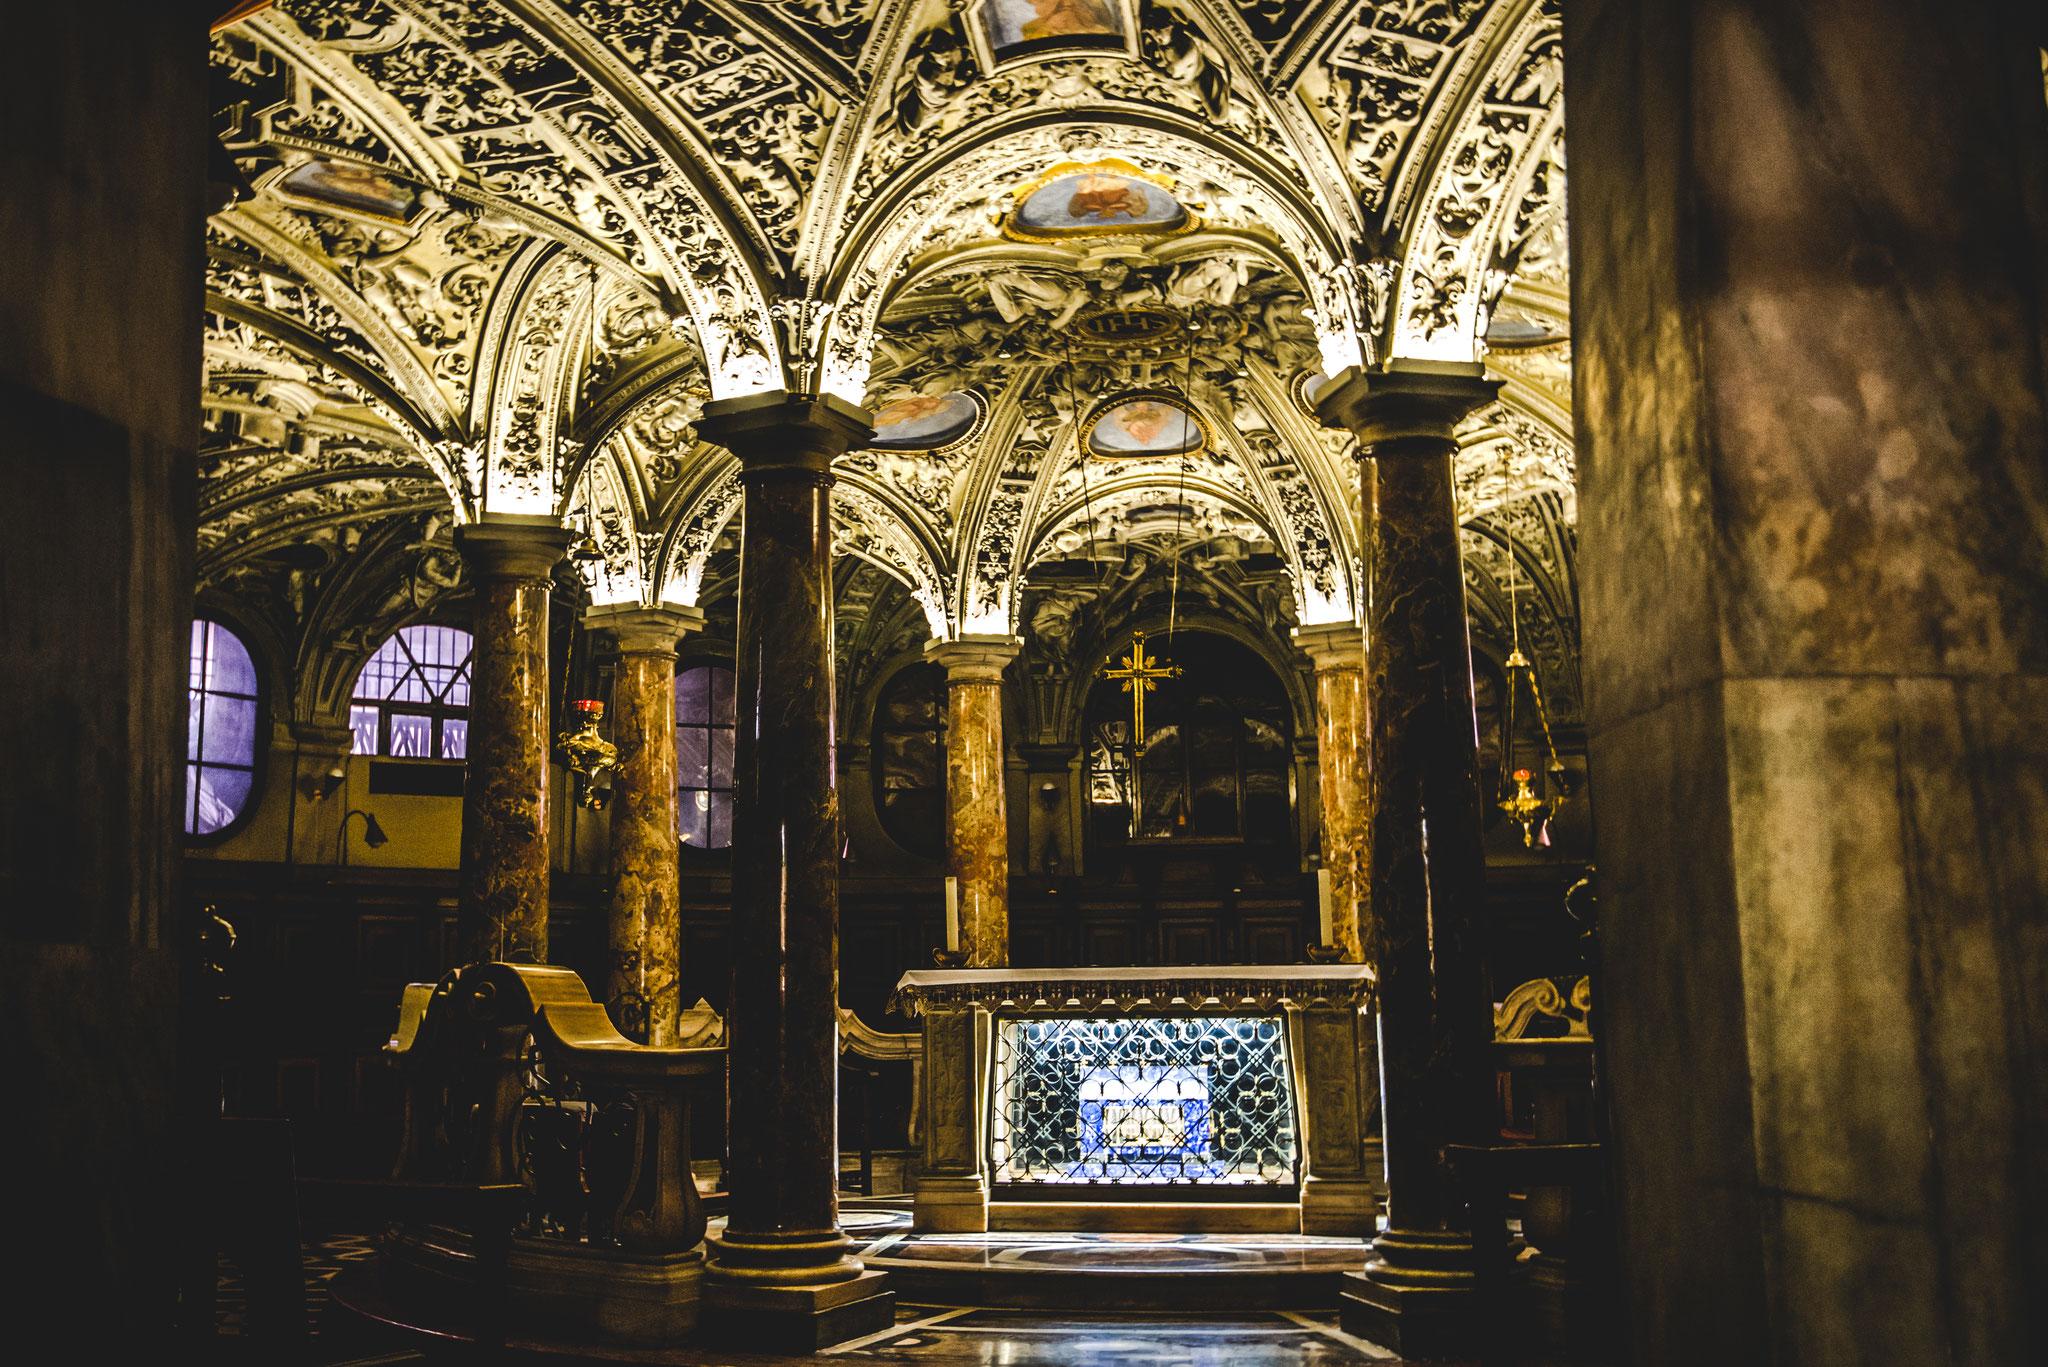 Visita guidata Duomo di Milano